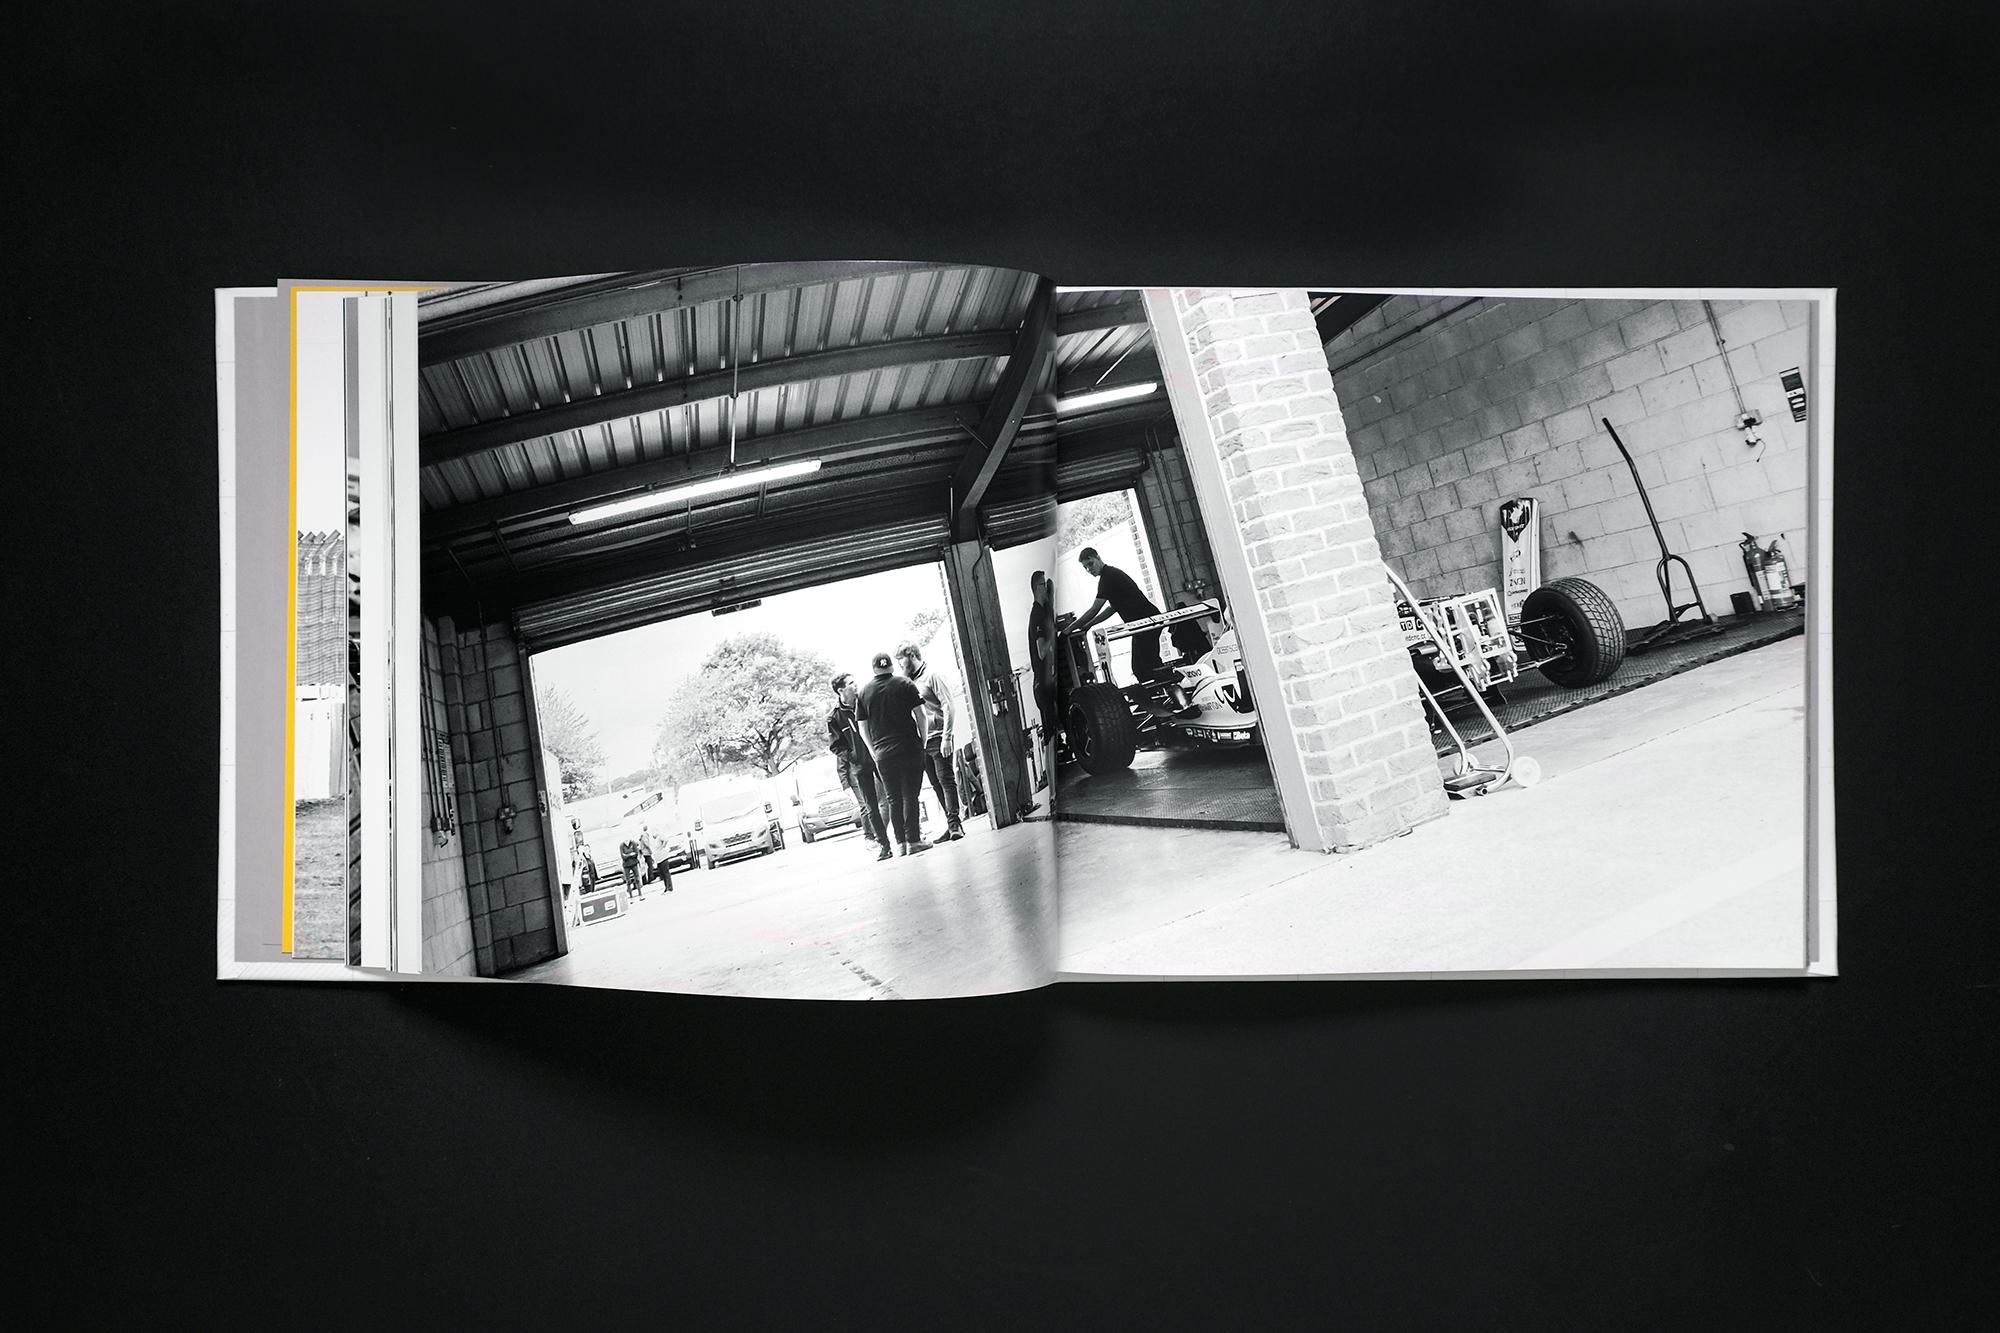 http://rusyndesign.co.uk/wp-content/uploads/2020/04/UWR-19-book-shots-10.jpg